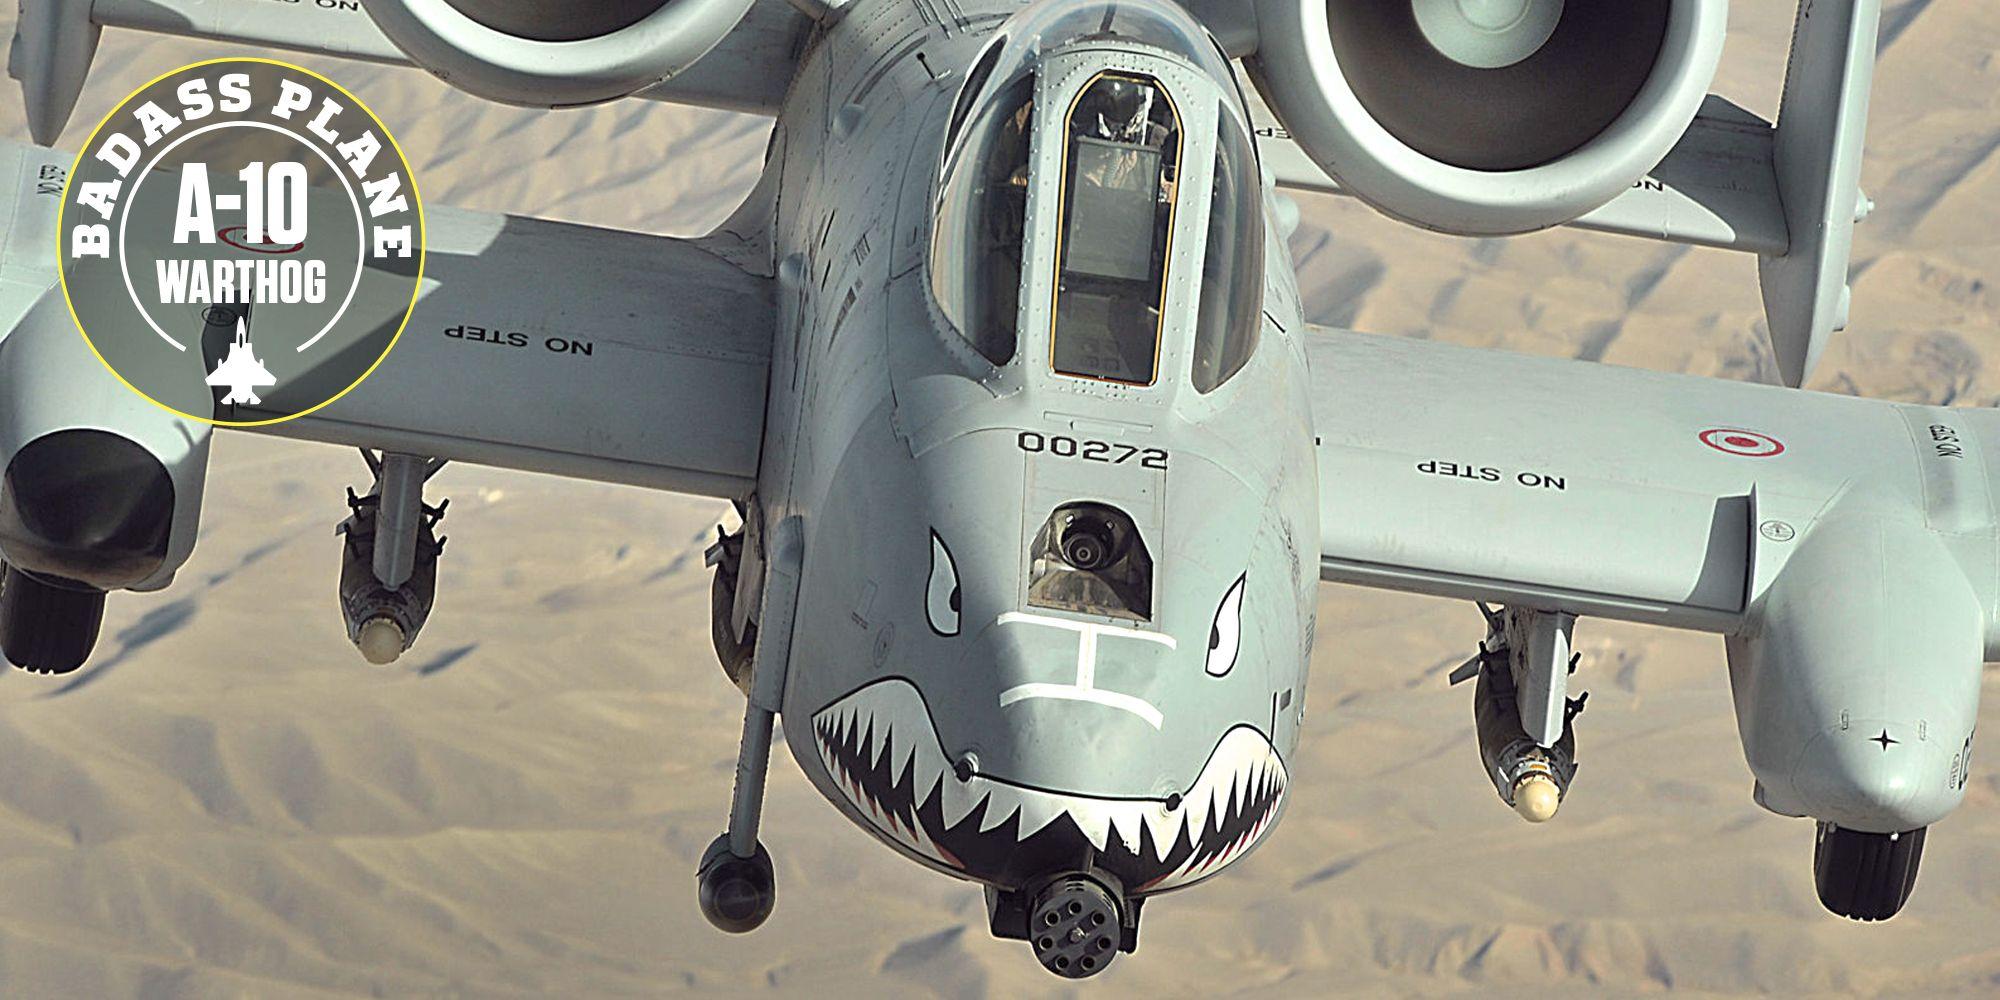 Why The A 10 Warthog Is Such Badass Plane Aircraft Hydraulic System Intelligent Diagrams Like